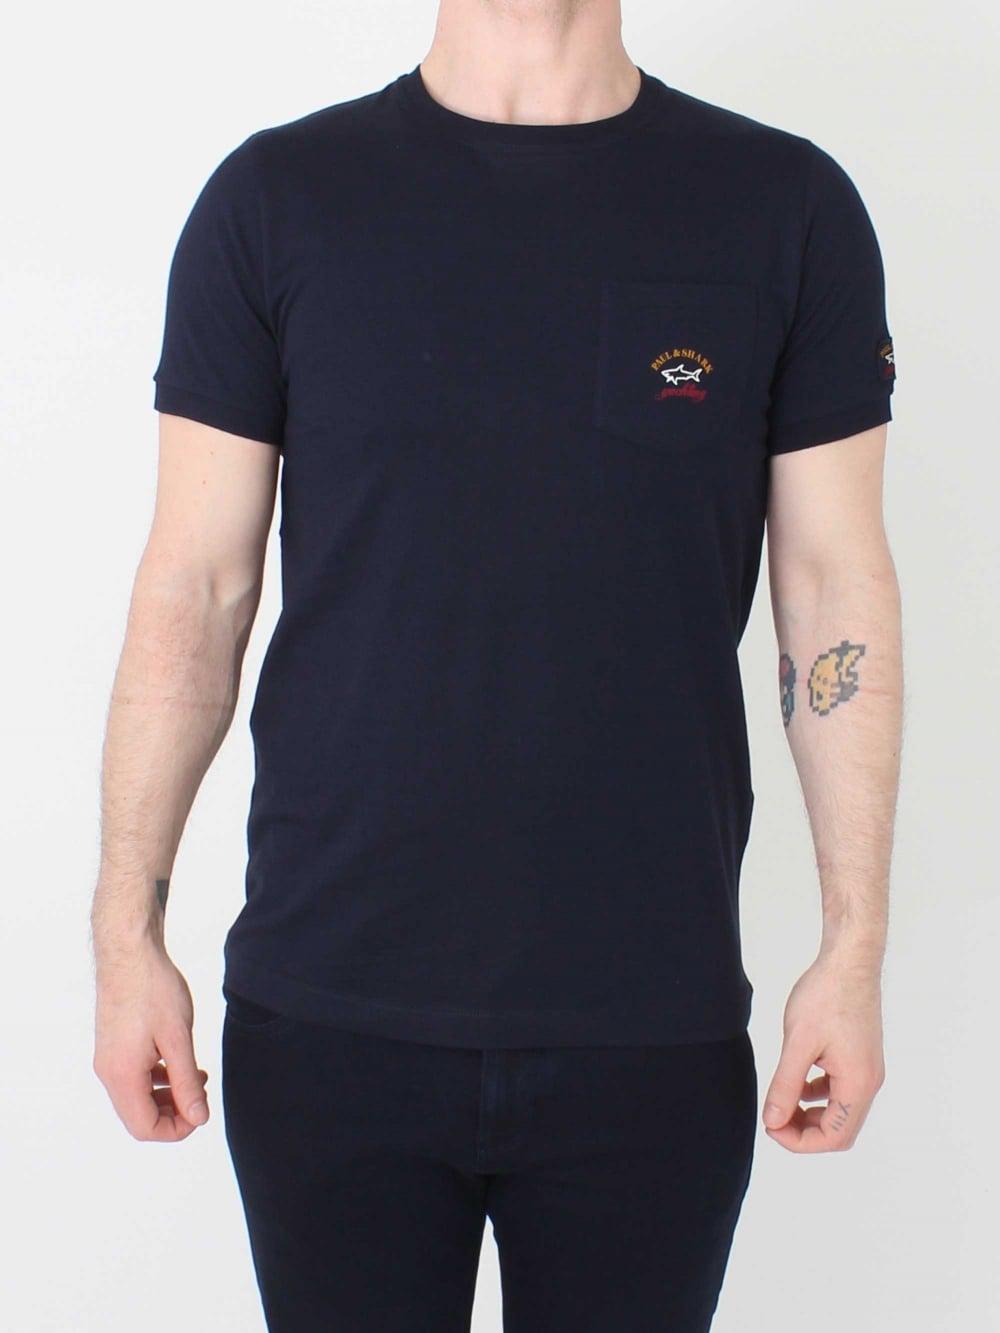 paul shark t shirt in dark navy northern threads. Black Bedroom Furniture Sets. Home Design Ideas